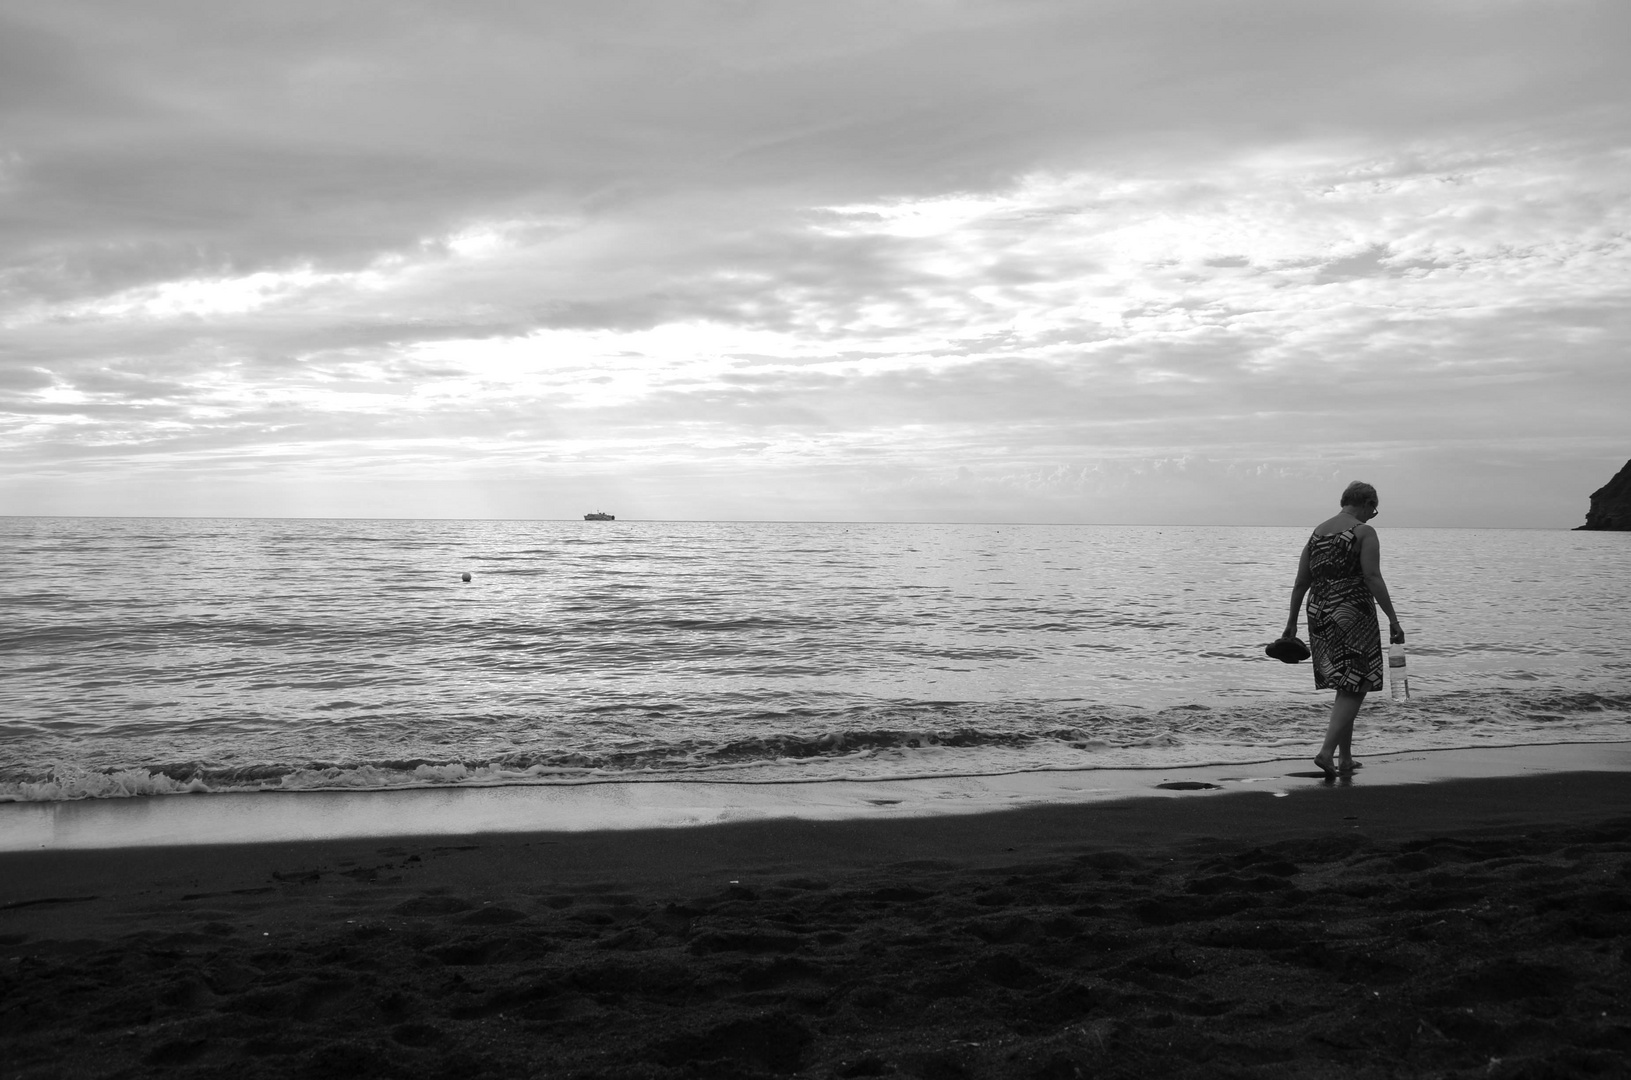 passeig marí